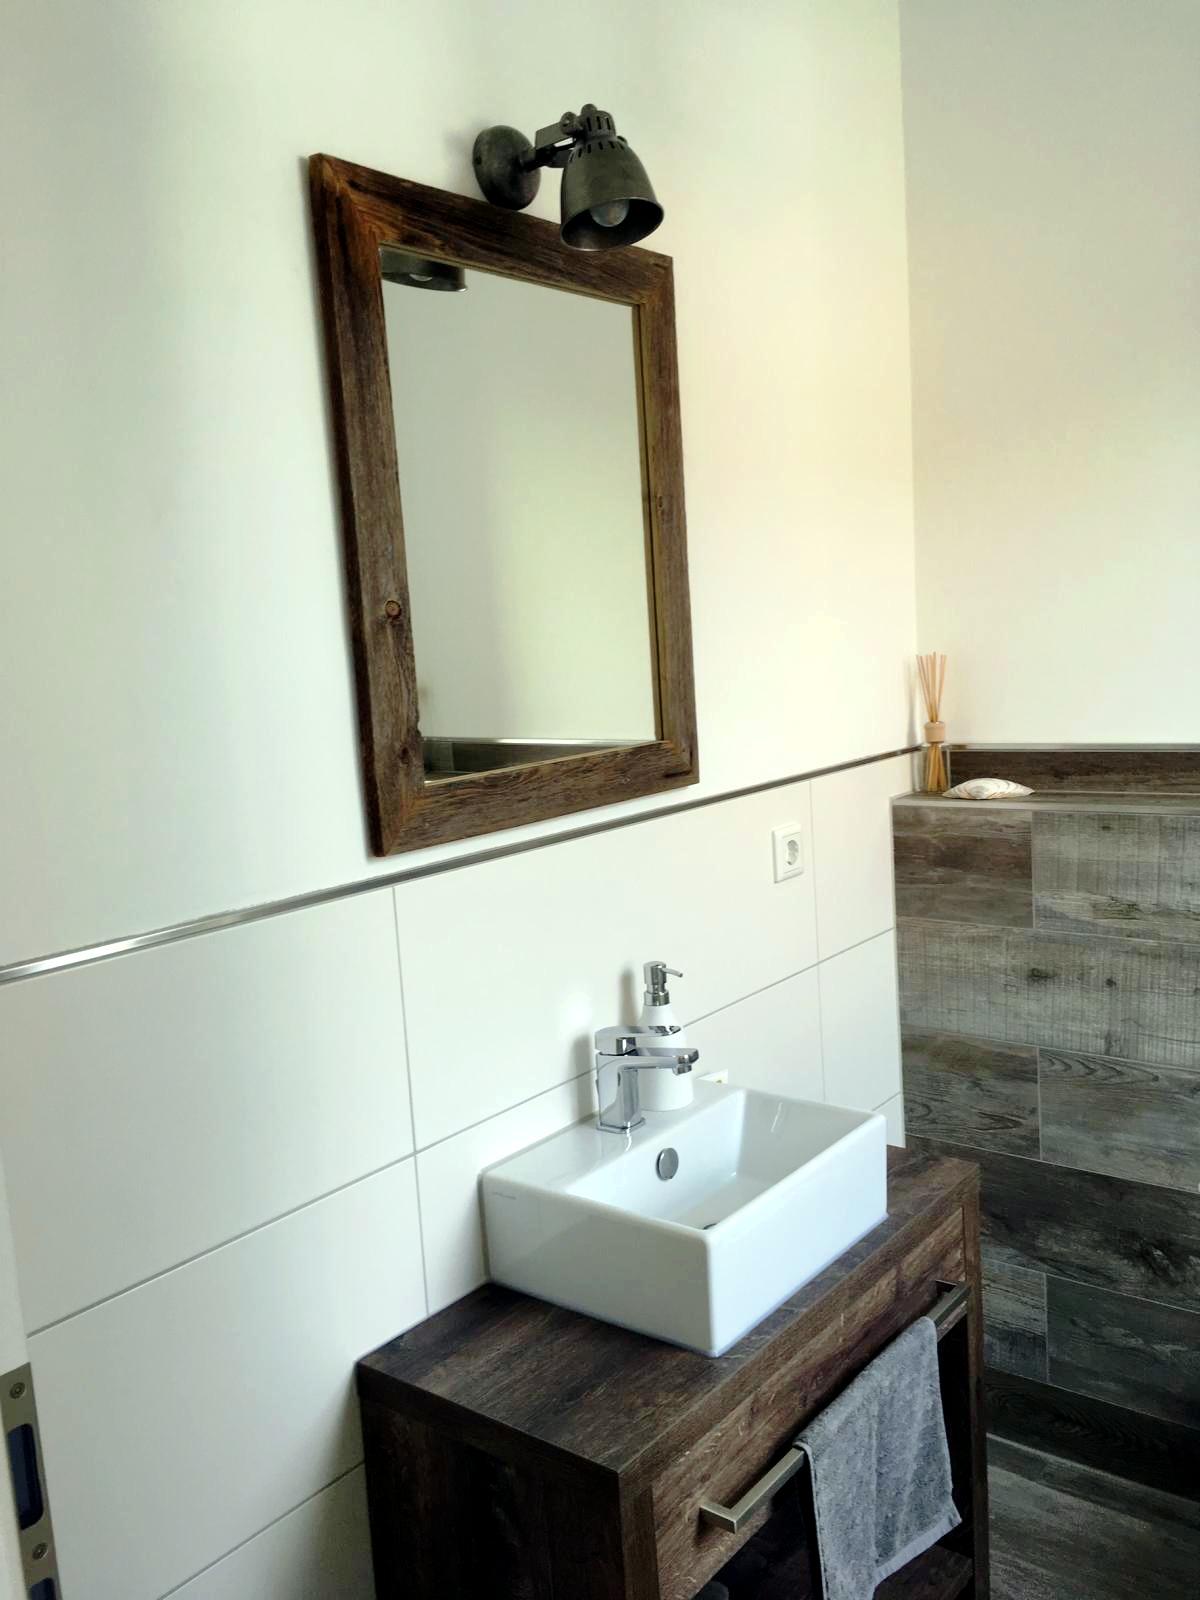 Kundenfotos - Rustikaler spiegel ...